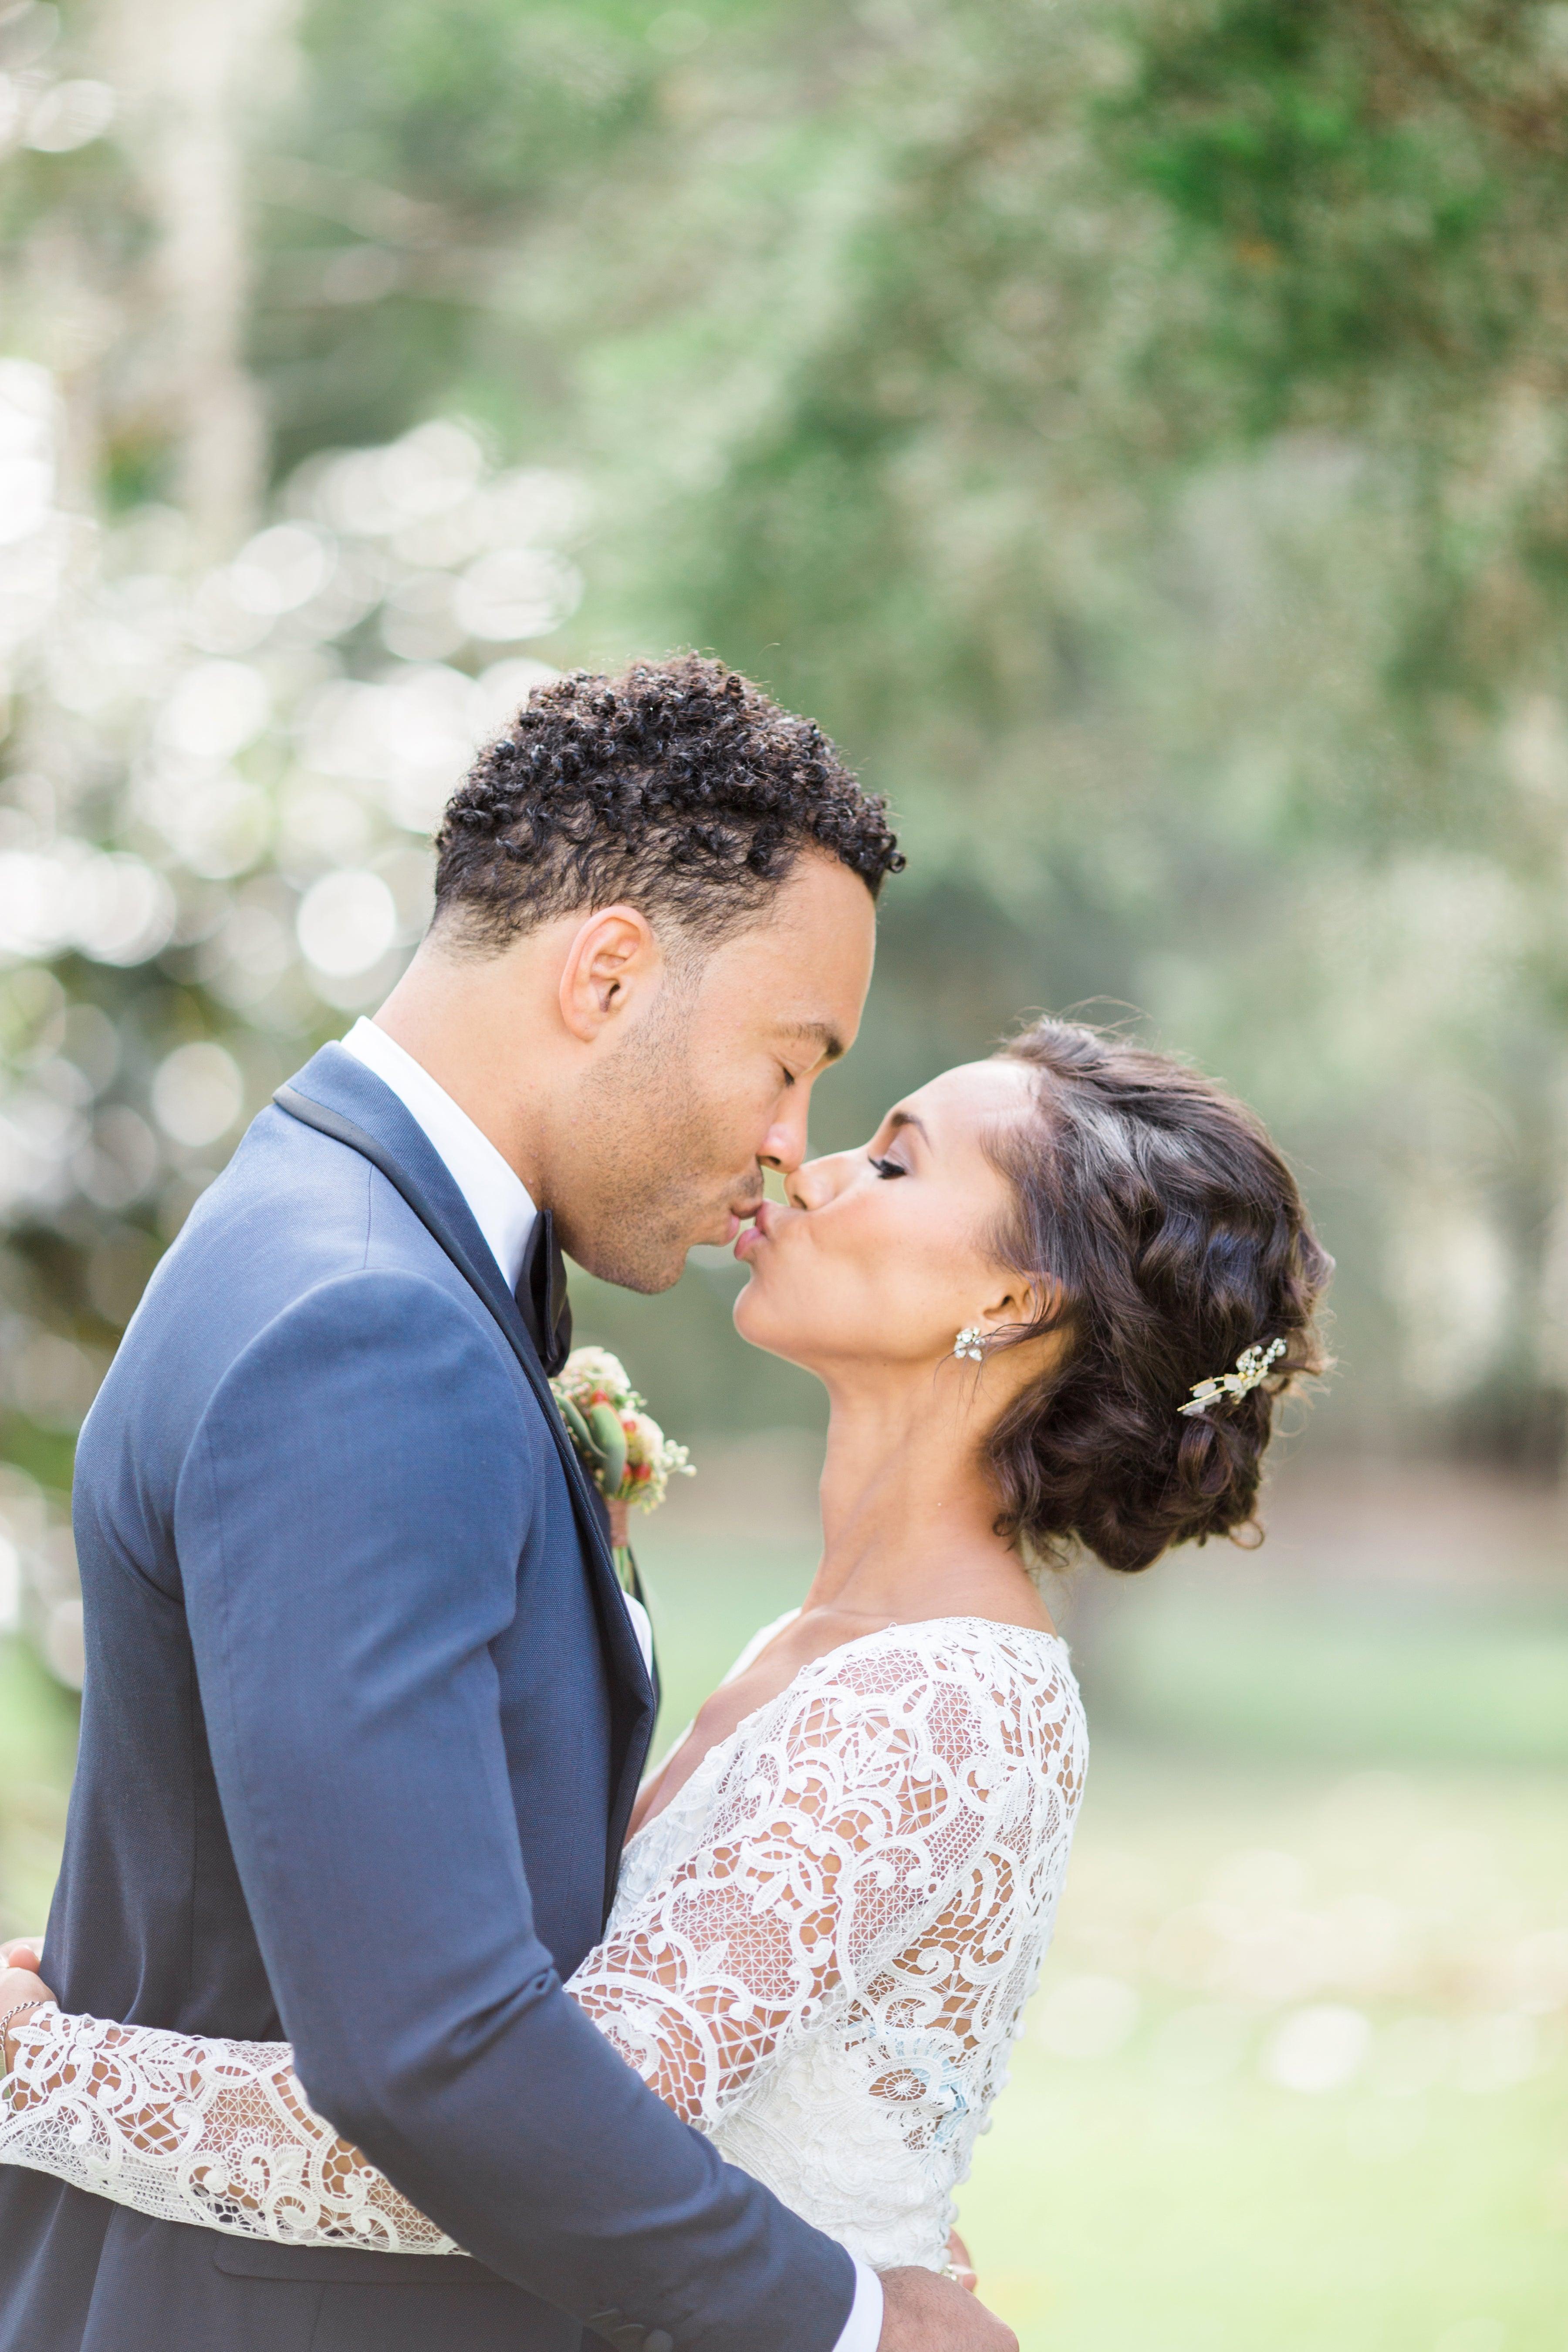 Wedding Photography Styles Explained: Bridal Bliss: Jason And Elena Spears Wedding Photos